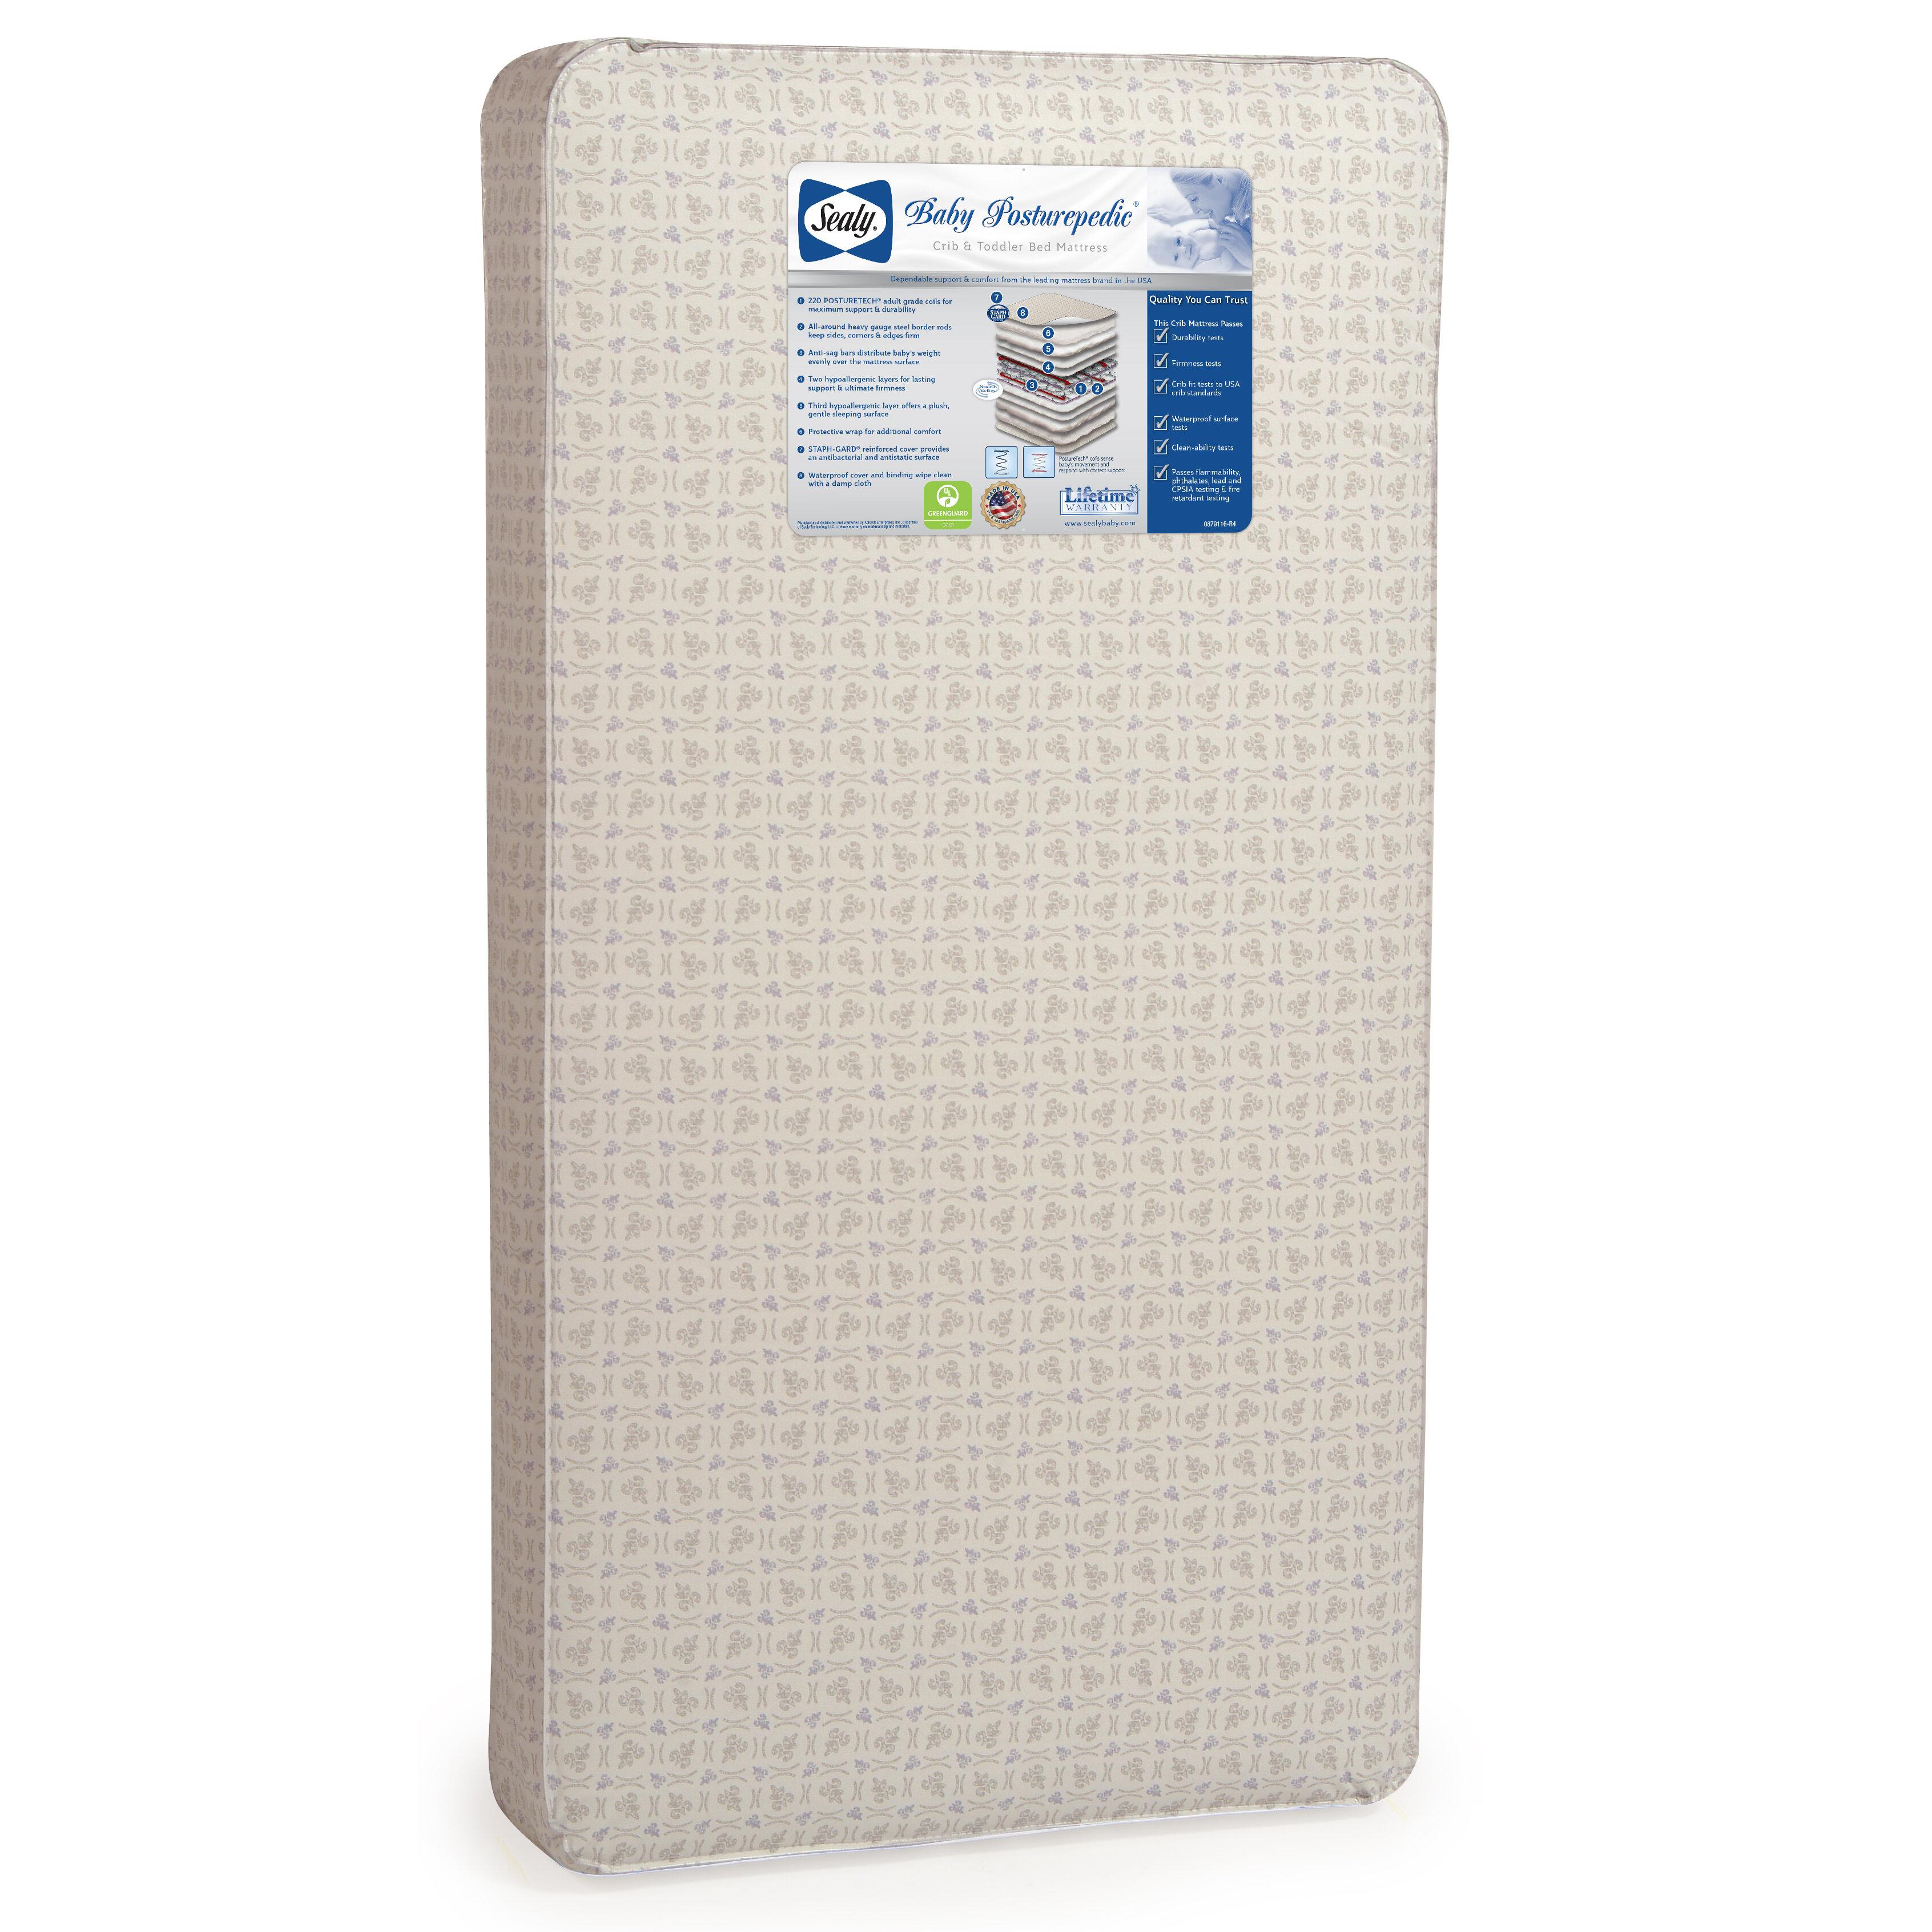 "sealy baby posturepedic 5.75"" crib mattress & reviews | wayfair"